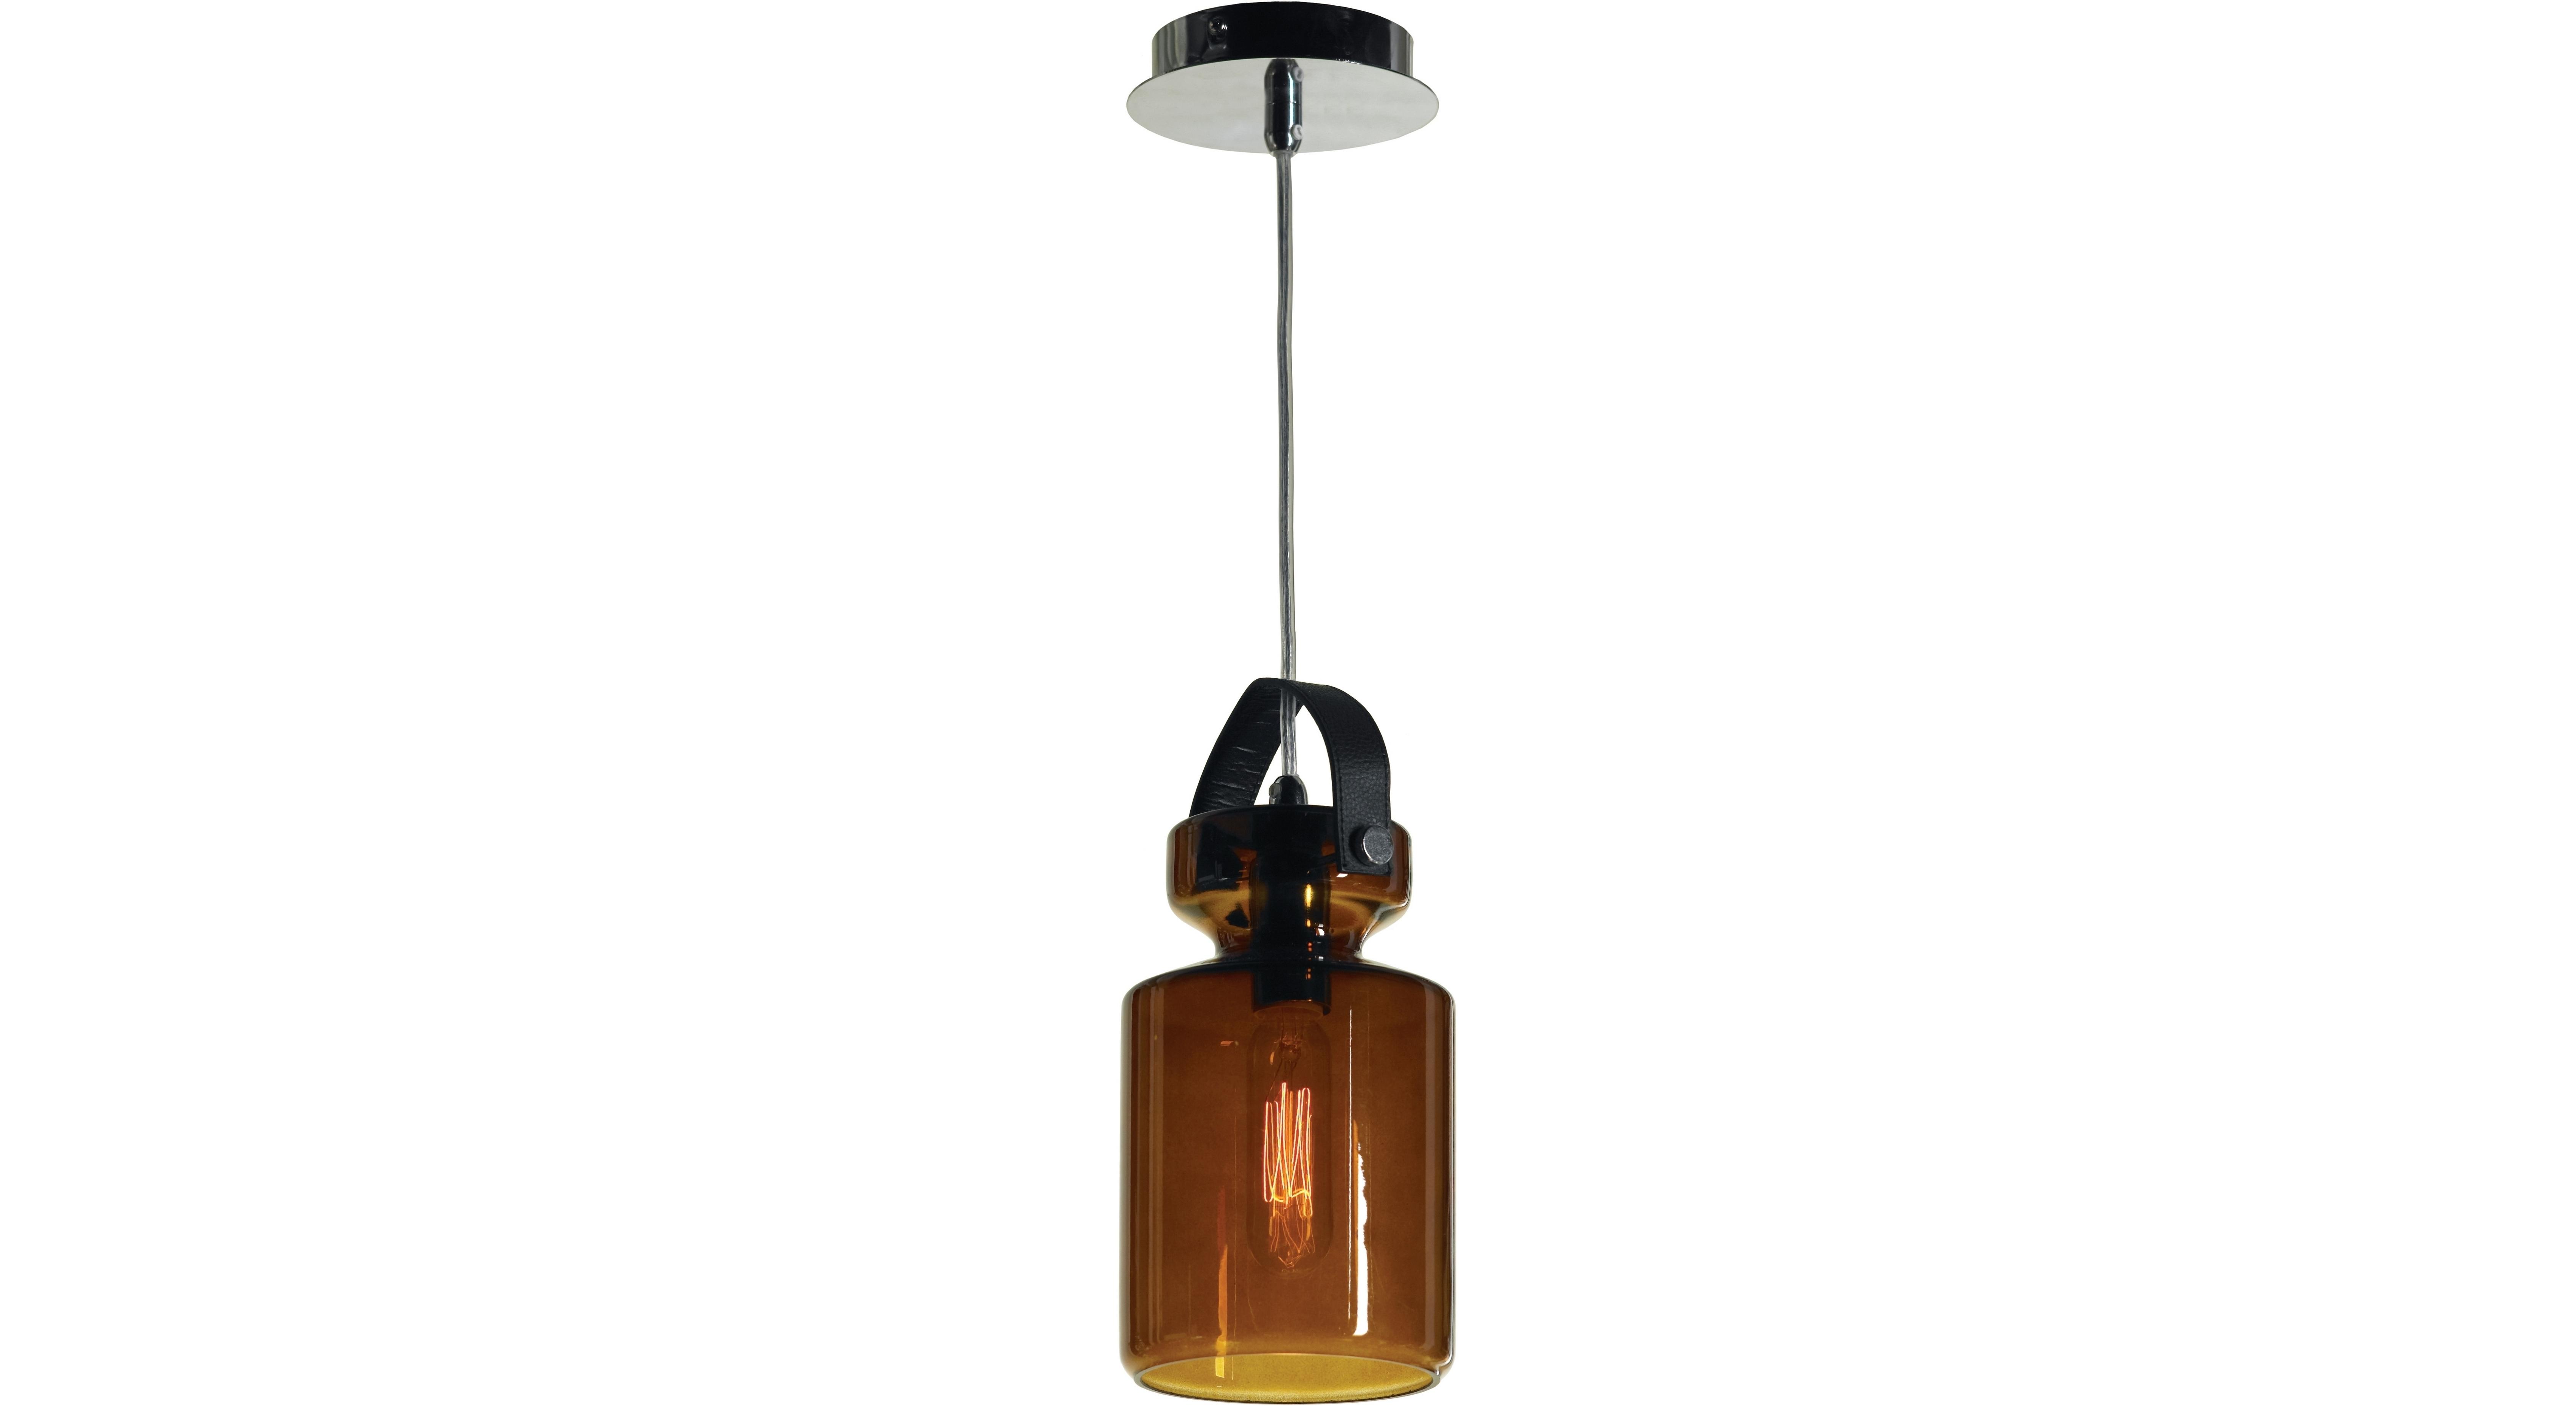 Подвесной светильникПодвесные светильники<br>Материал: металл<br>Лампа: 1*40W<br>Цоколь: E14<br>Цвет: хром, коричневое стекло<br><br>Material: Металл<br>Height см: 140<br>Diameter см: 13